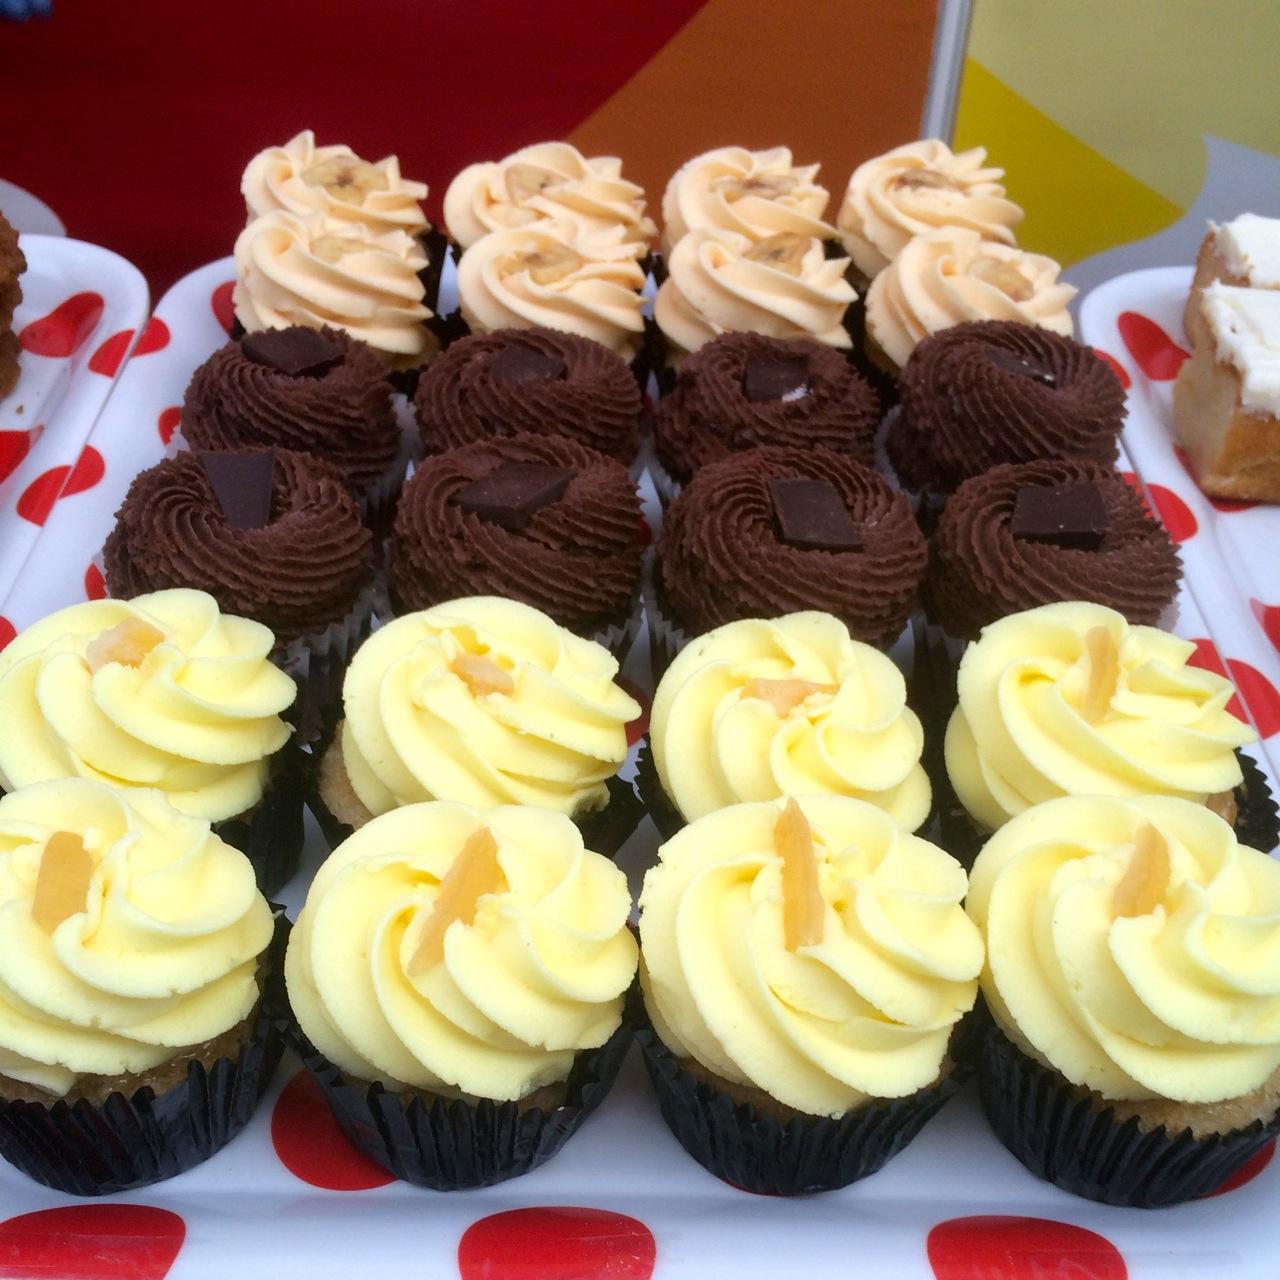 https://i2.wp.com/fatgayvegan.com/wp-content/uploads/2015/07/More-Ms-Cupcake-at-Just-V-Show.jpg?fit=1280%2C1280